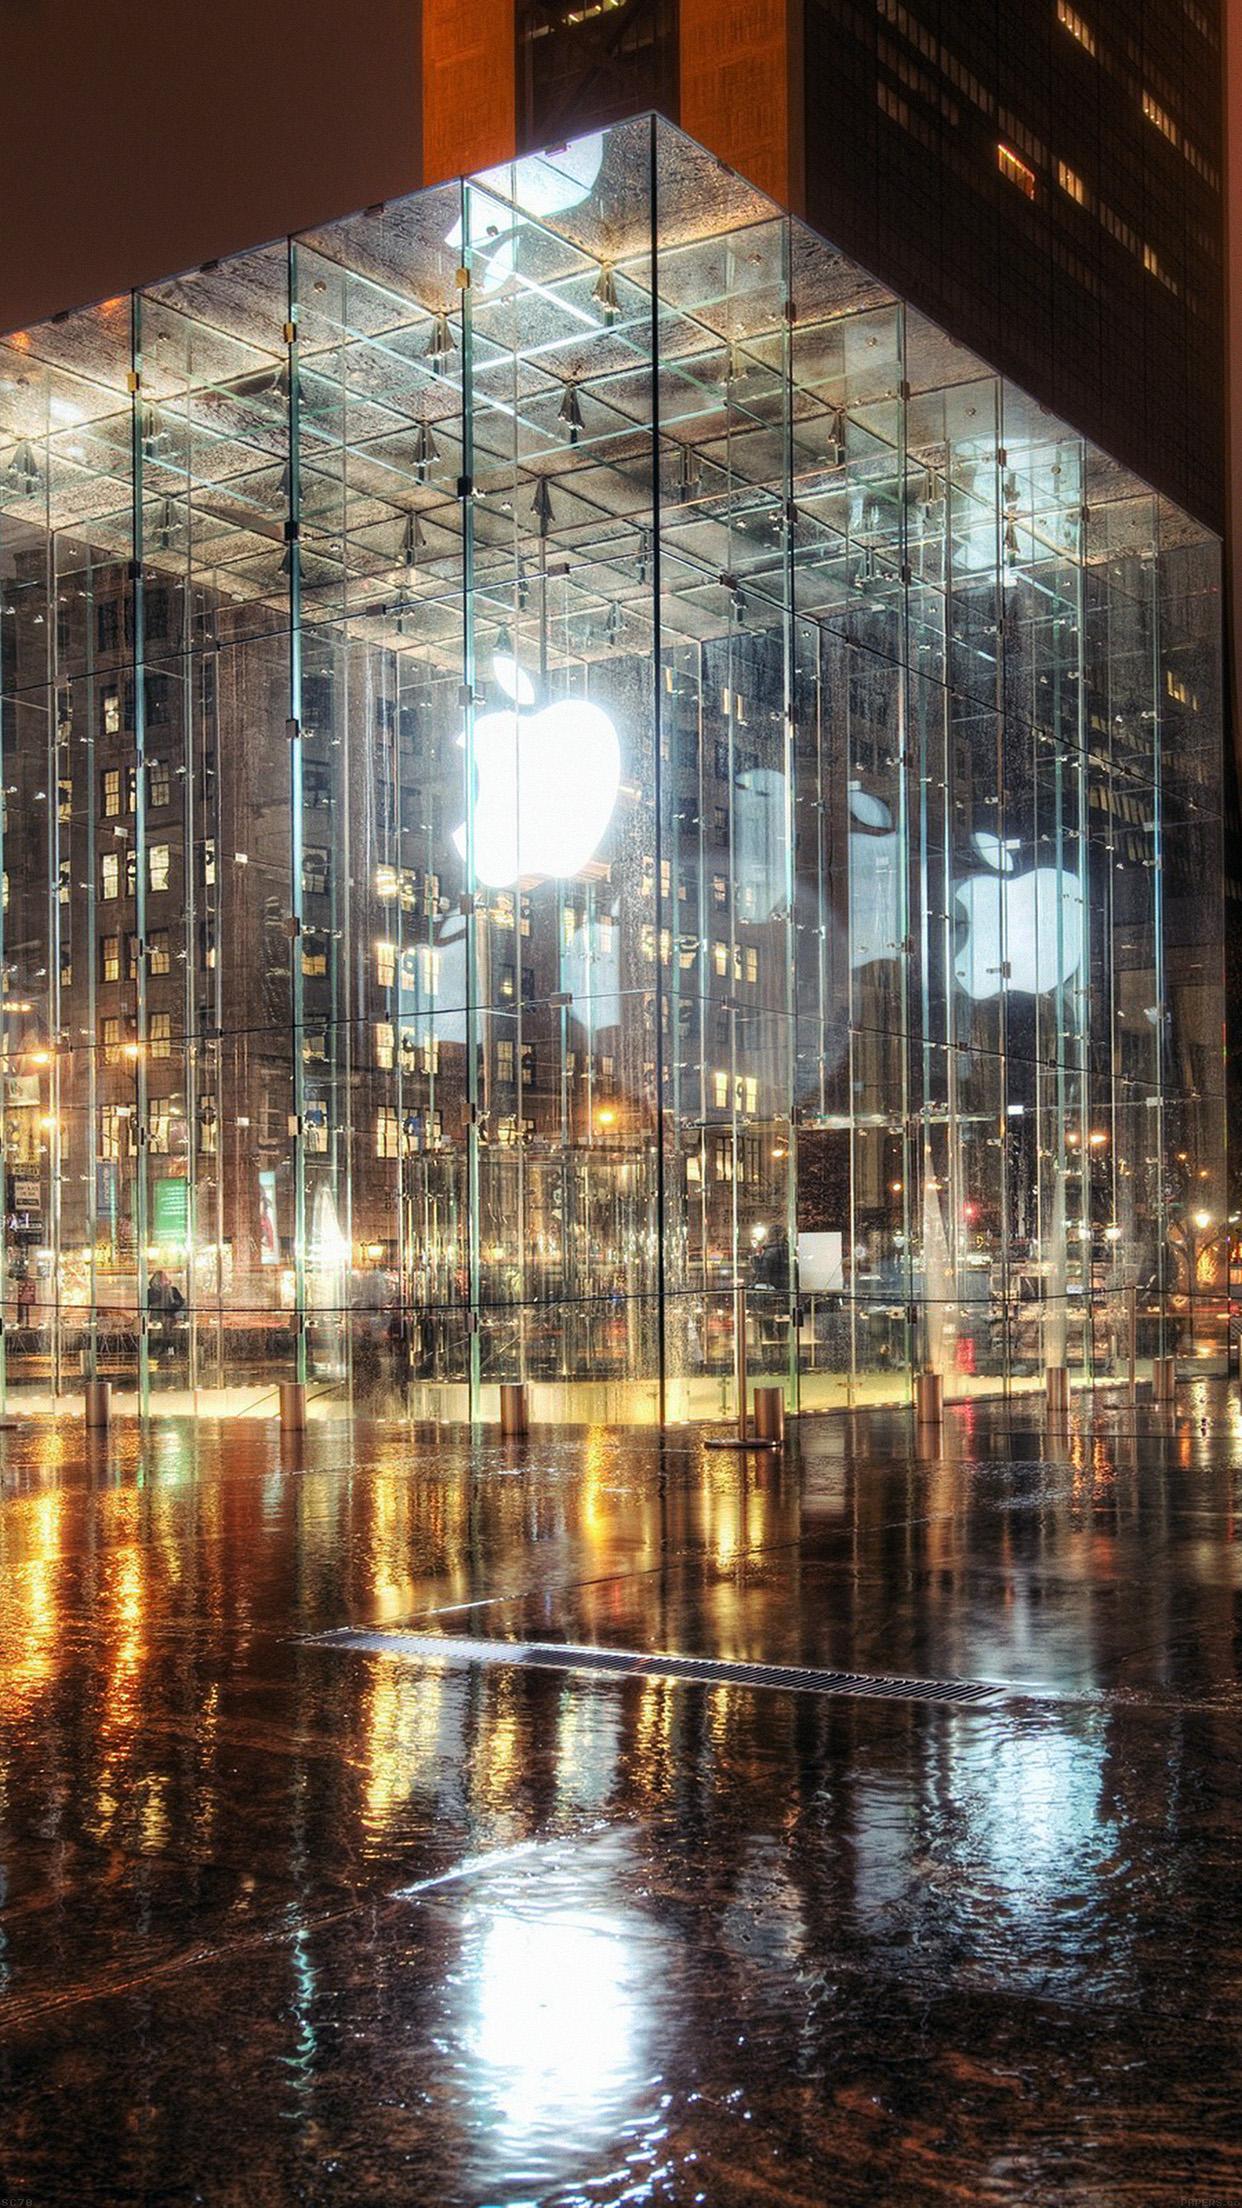 Iphone7papers Mh73 Raining Apple Store Newyork